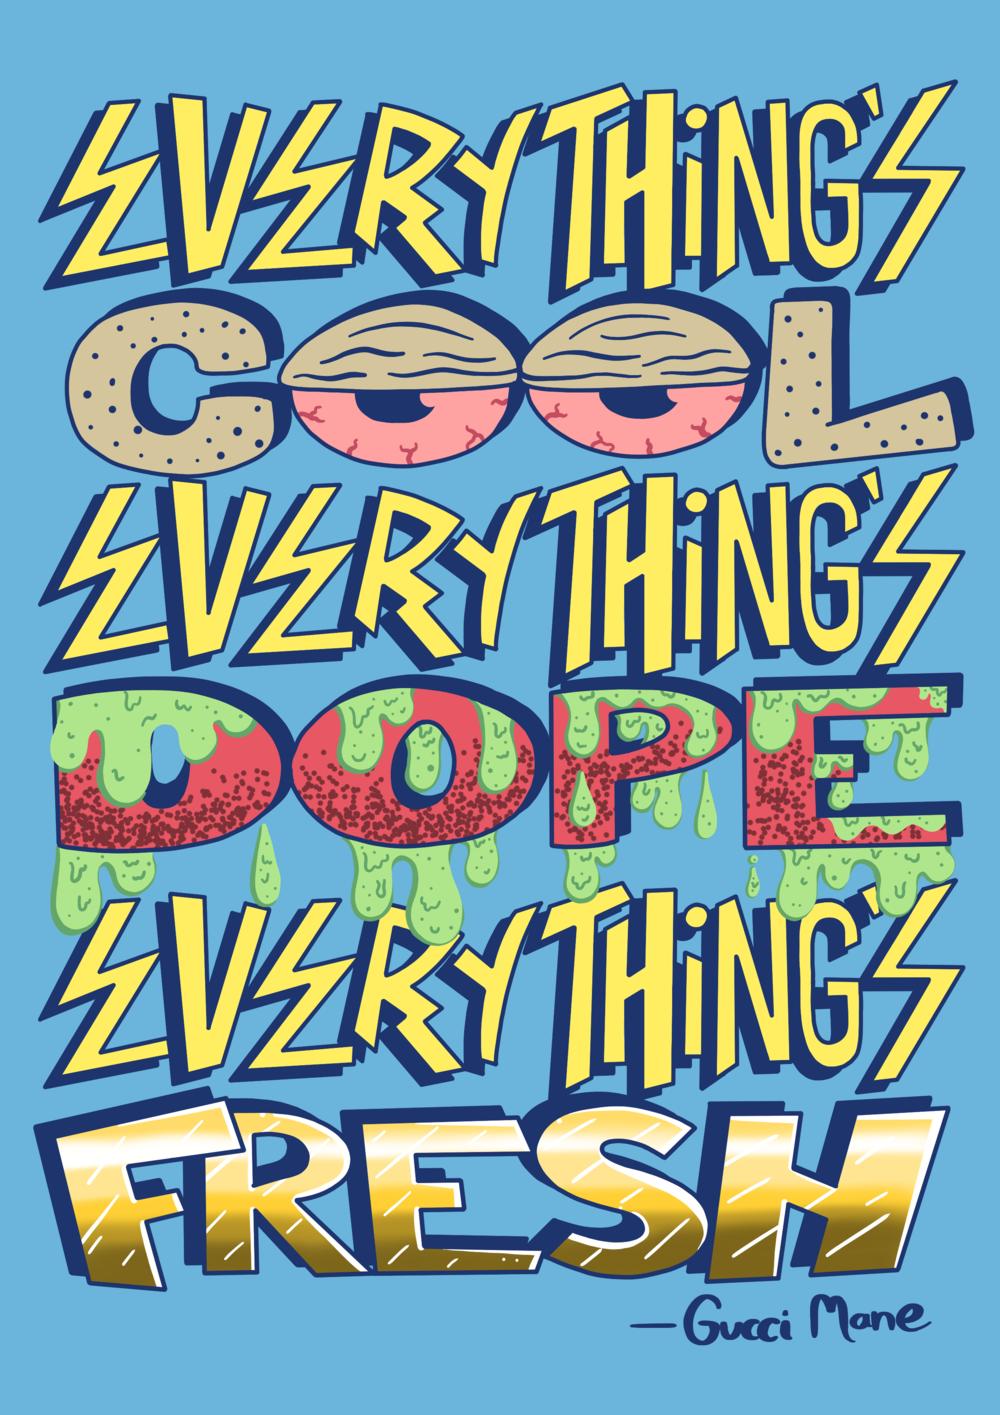 Gucci Mane Illustrated Quote